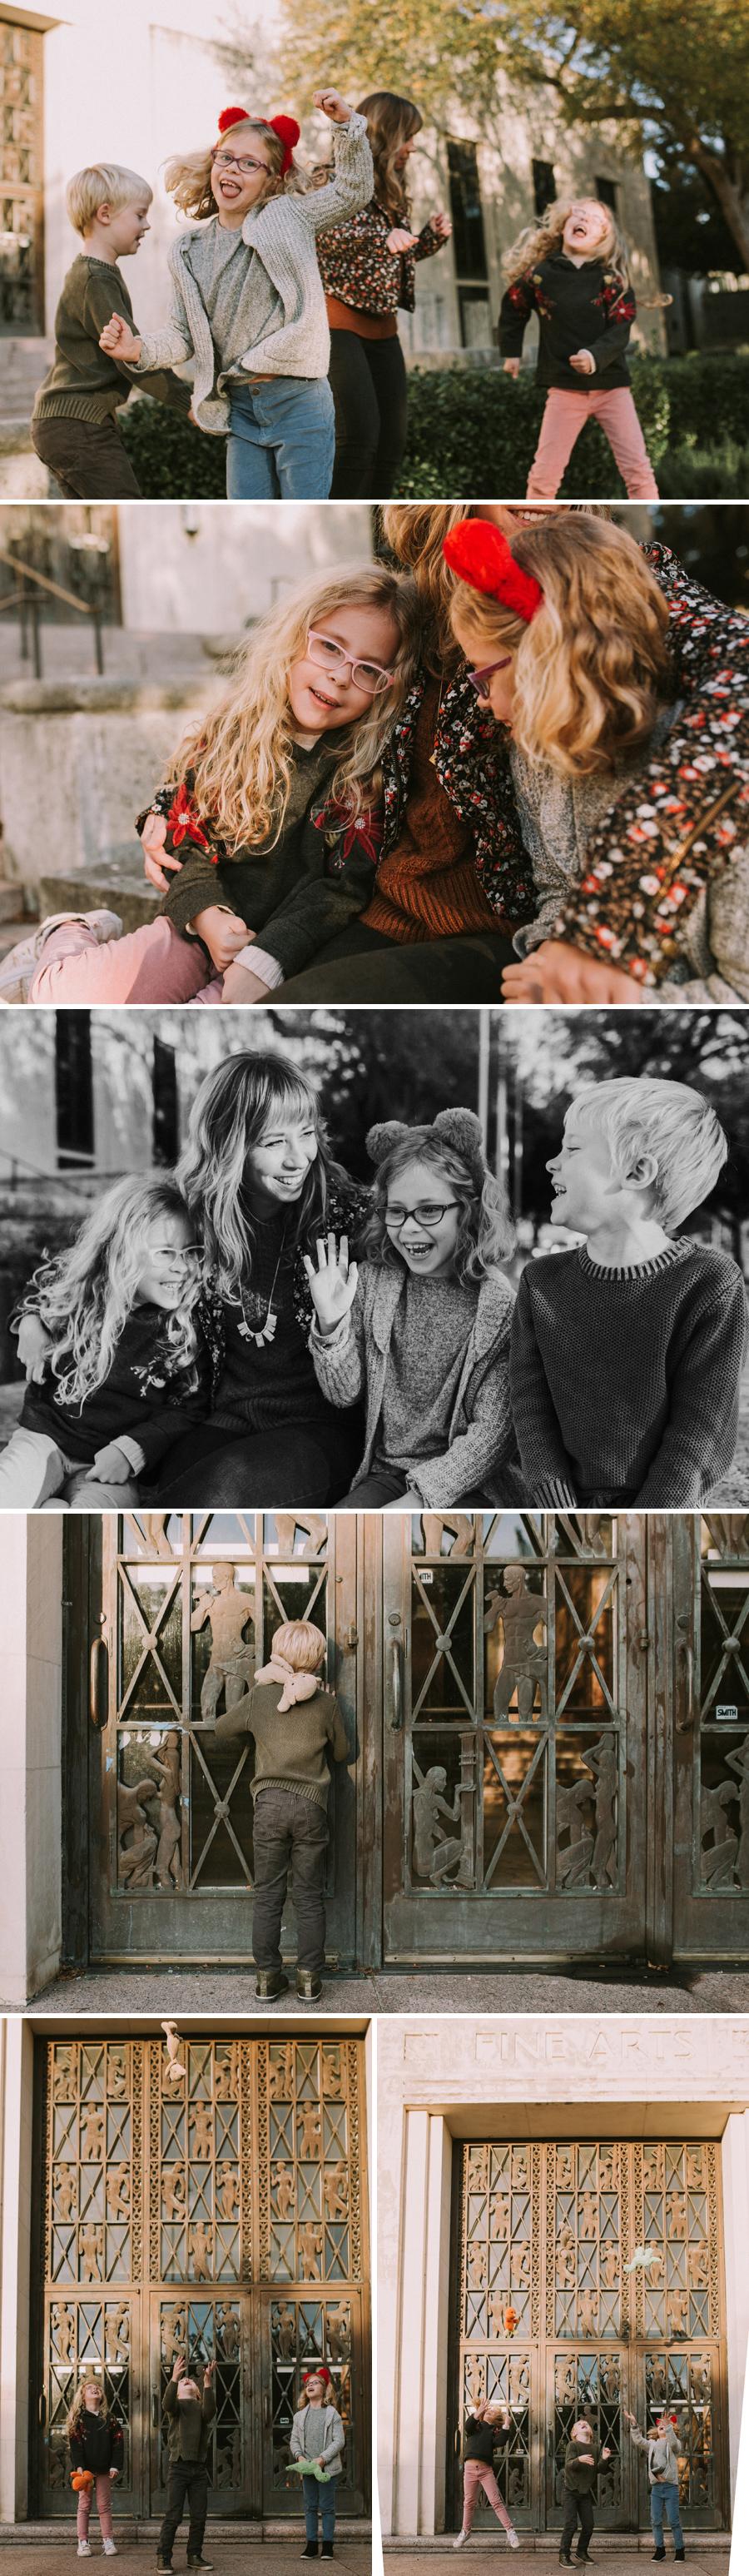 Connecticut-Family-Photographercomp006.jpg